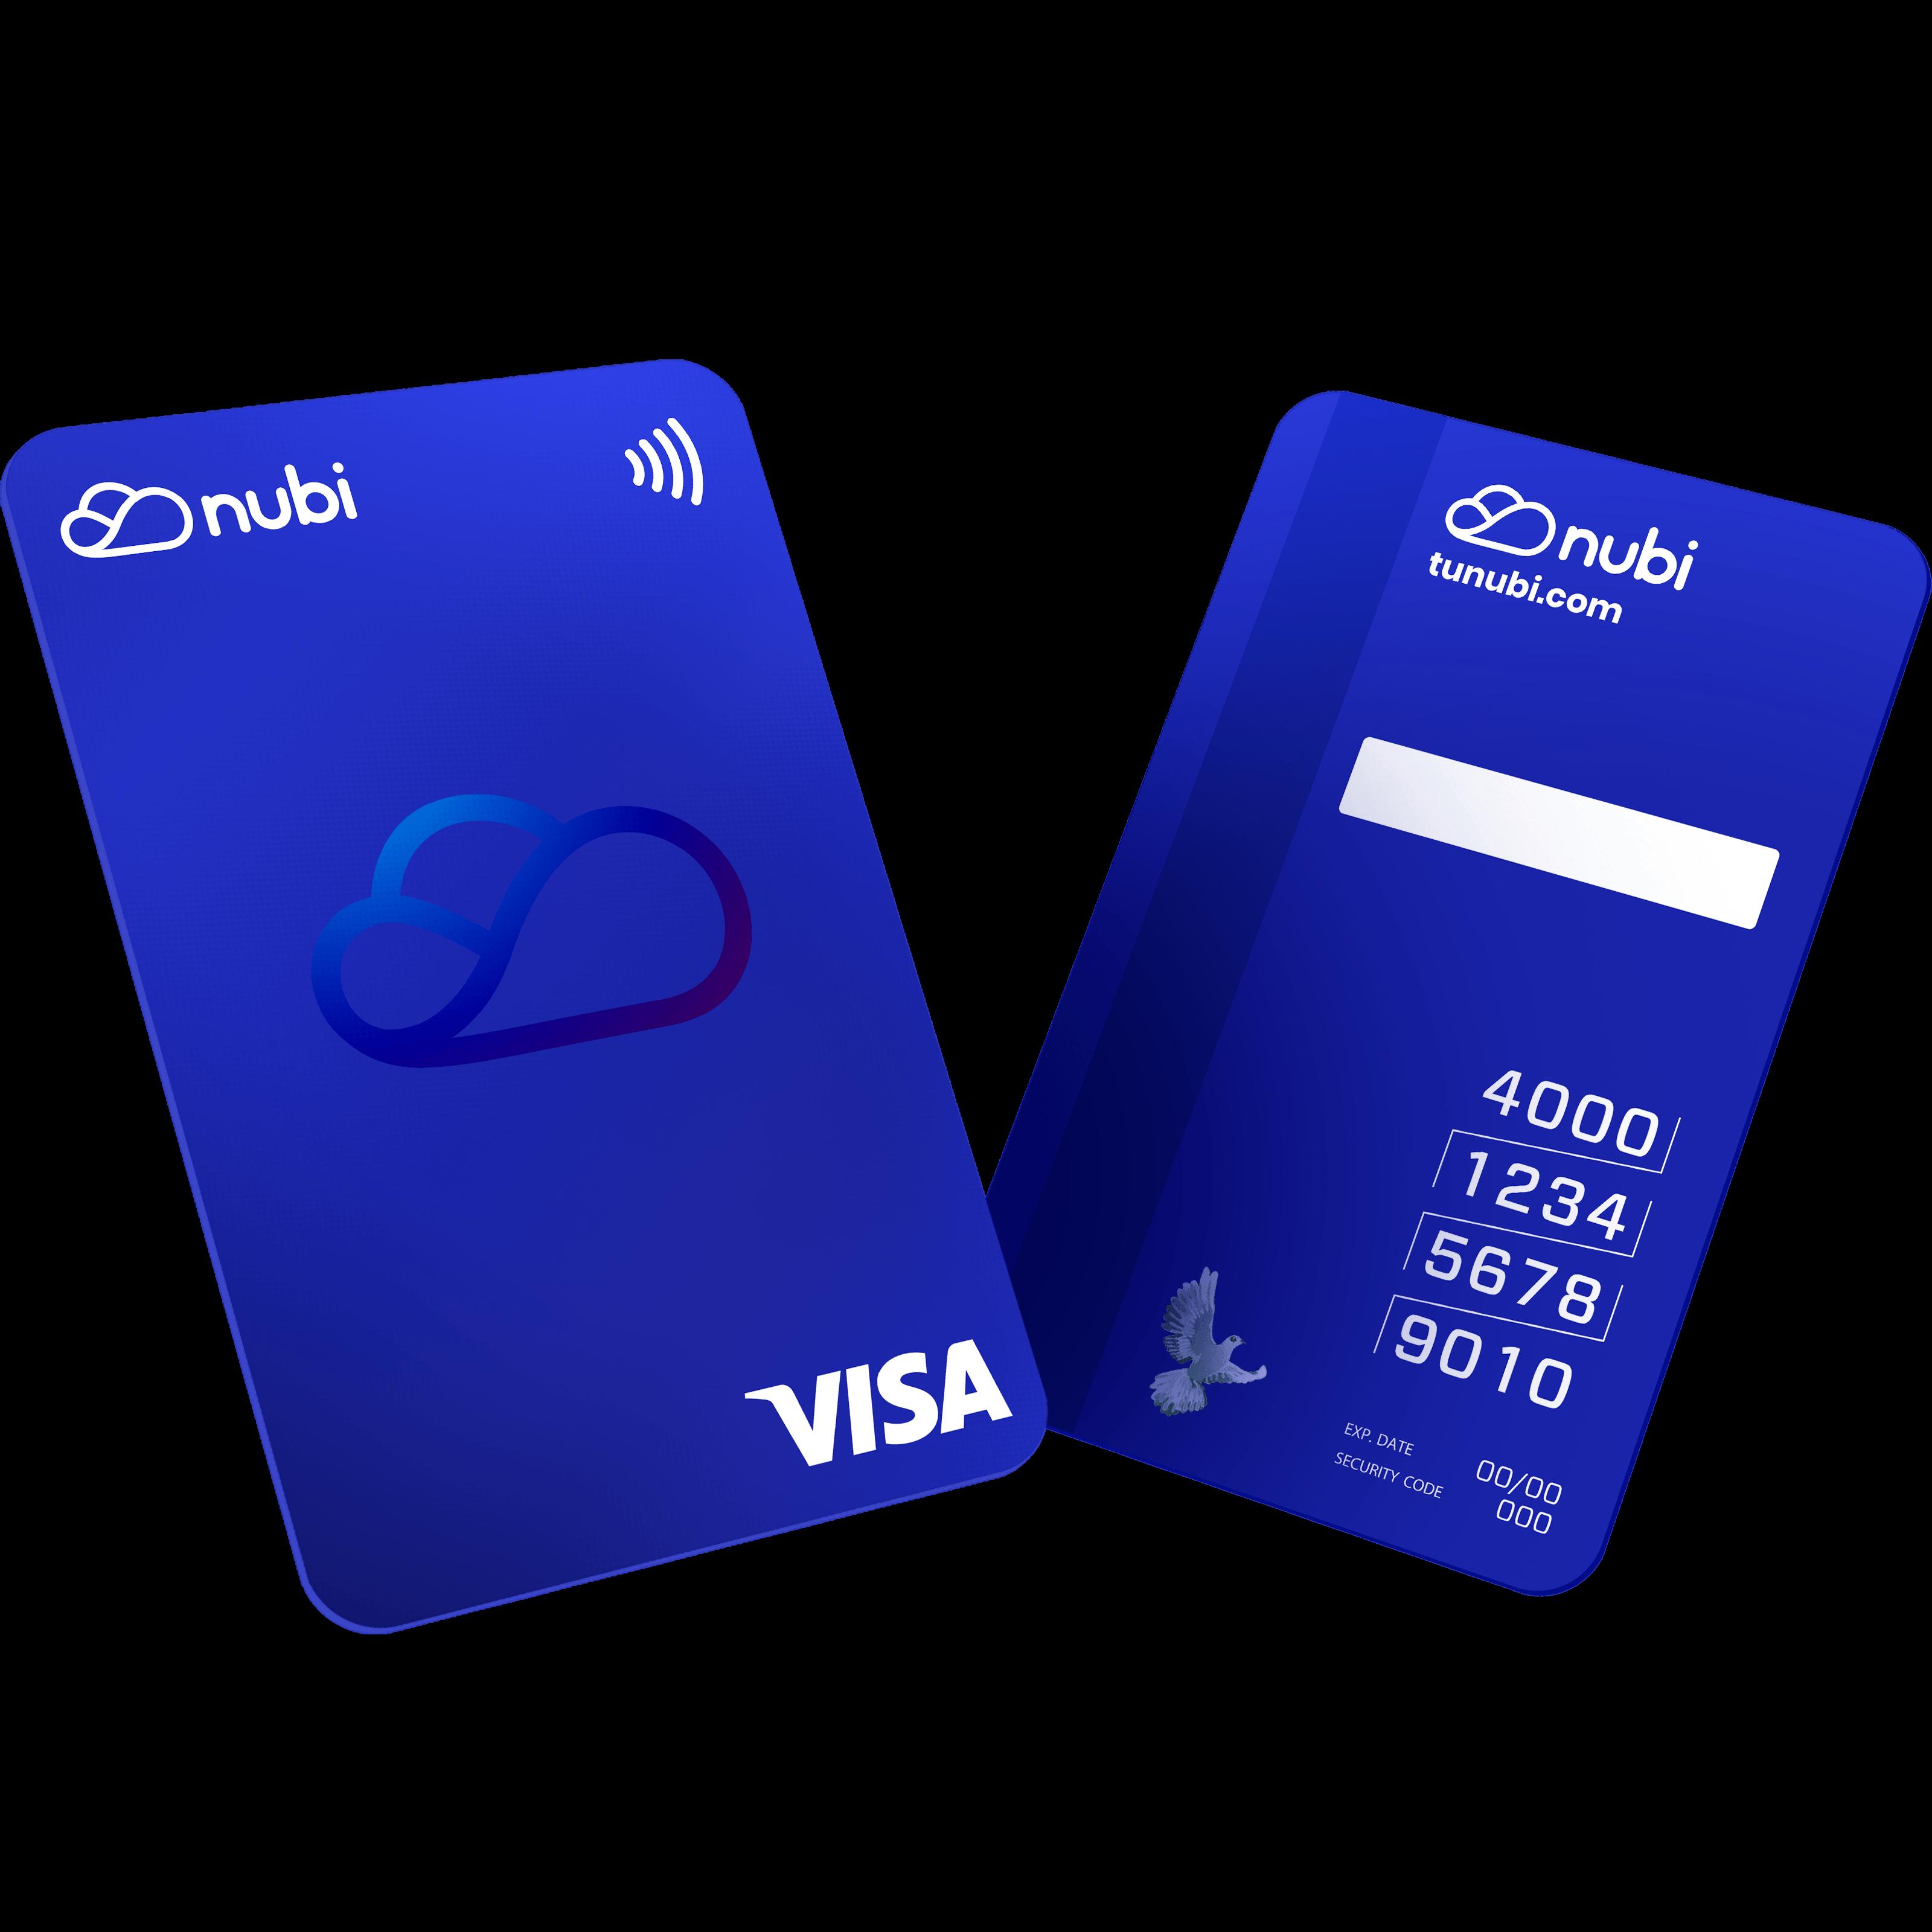 La tarjeta prepaga Visa de Nubi será la primera con diseño vertical